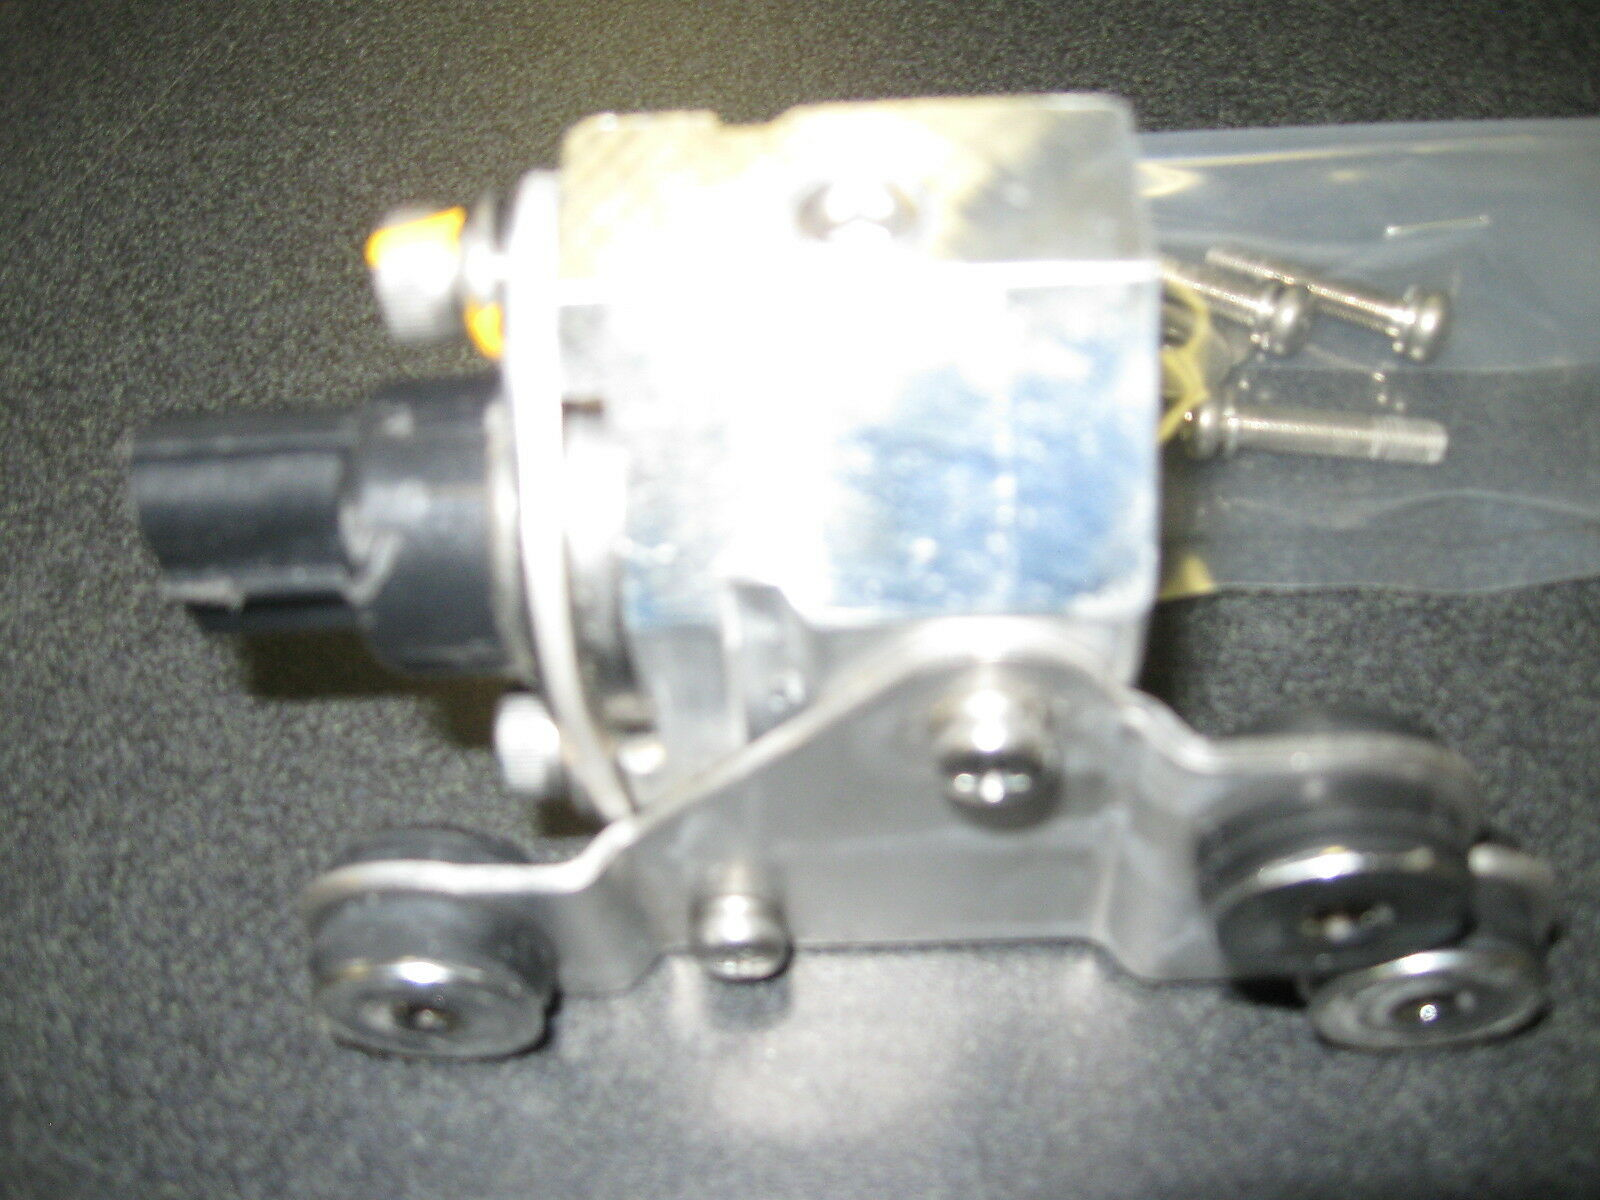 Yamaha Außenborder Kraftstoffleitung Kraftstoffleitung Außenborder 60V-13938-00-00 mit Sensor 60V-82380-00-00 1ad158